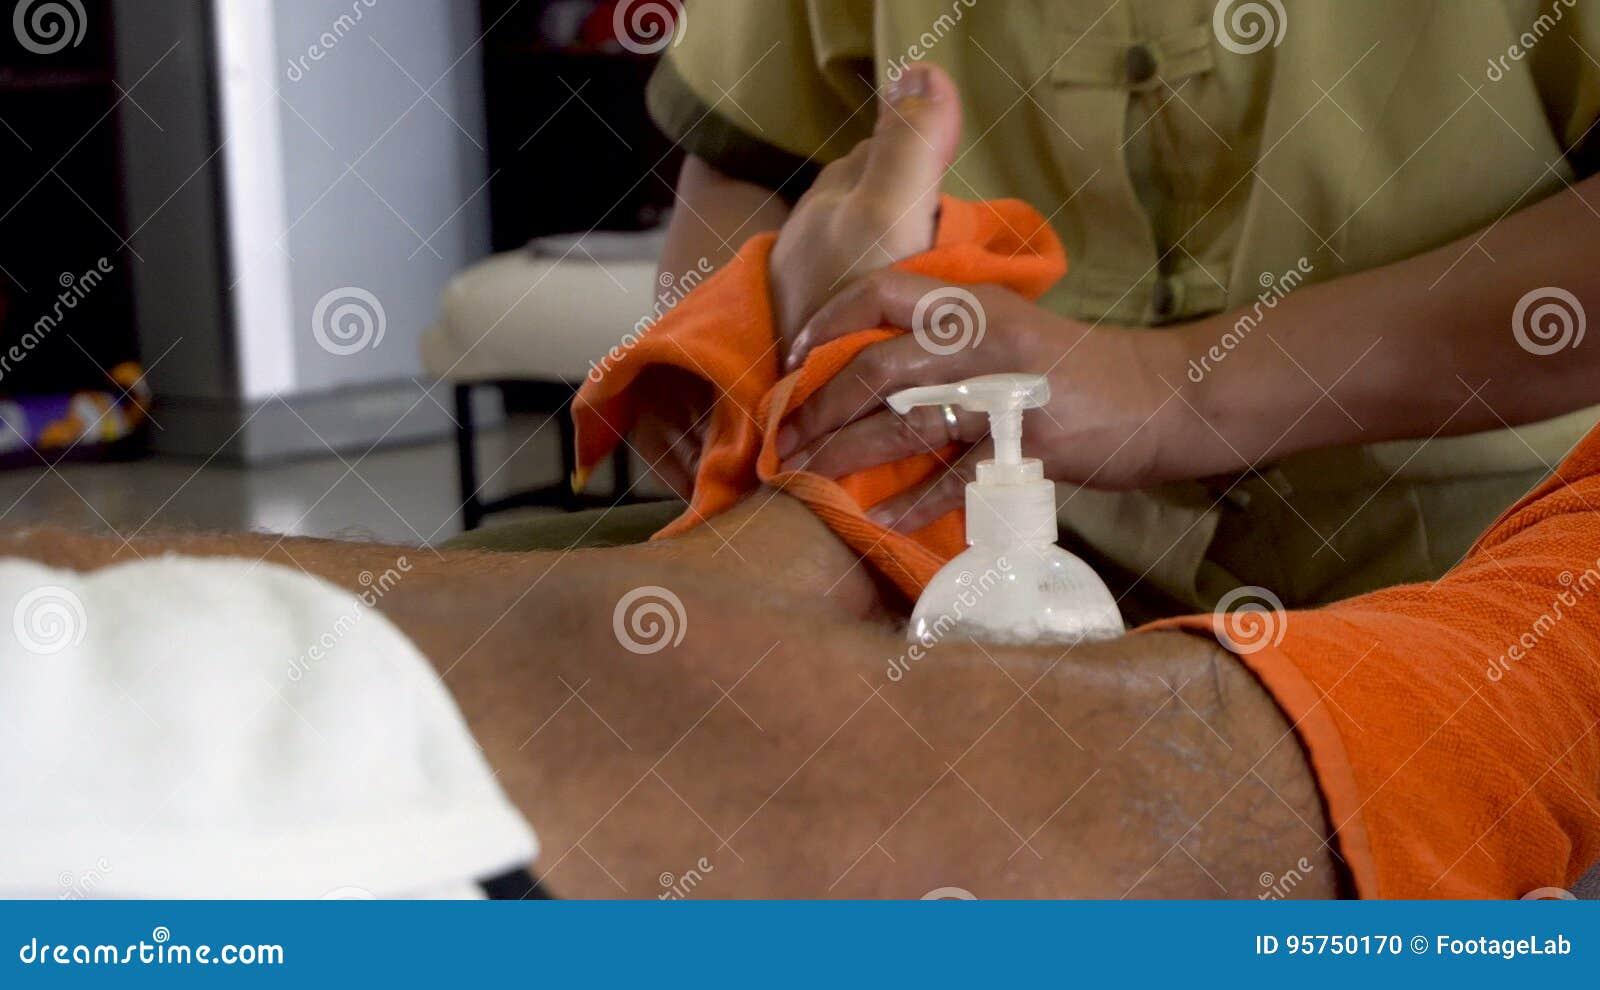 Male Foot Massage Stock Footage & Videos - 273 Stock Videos